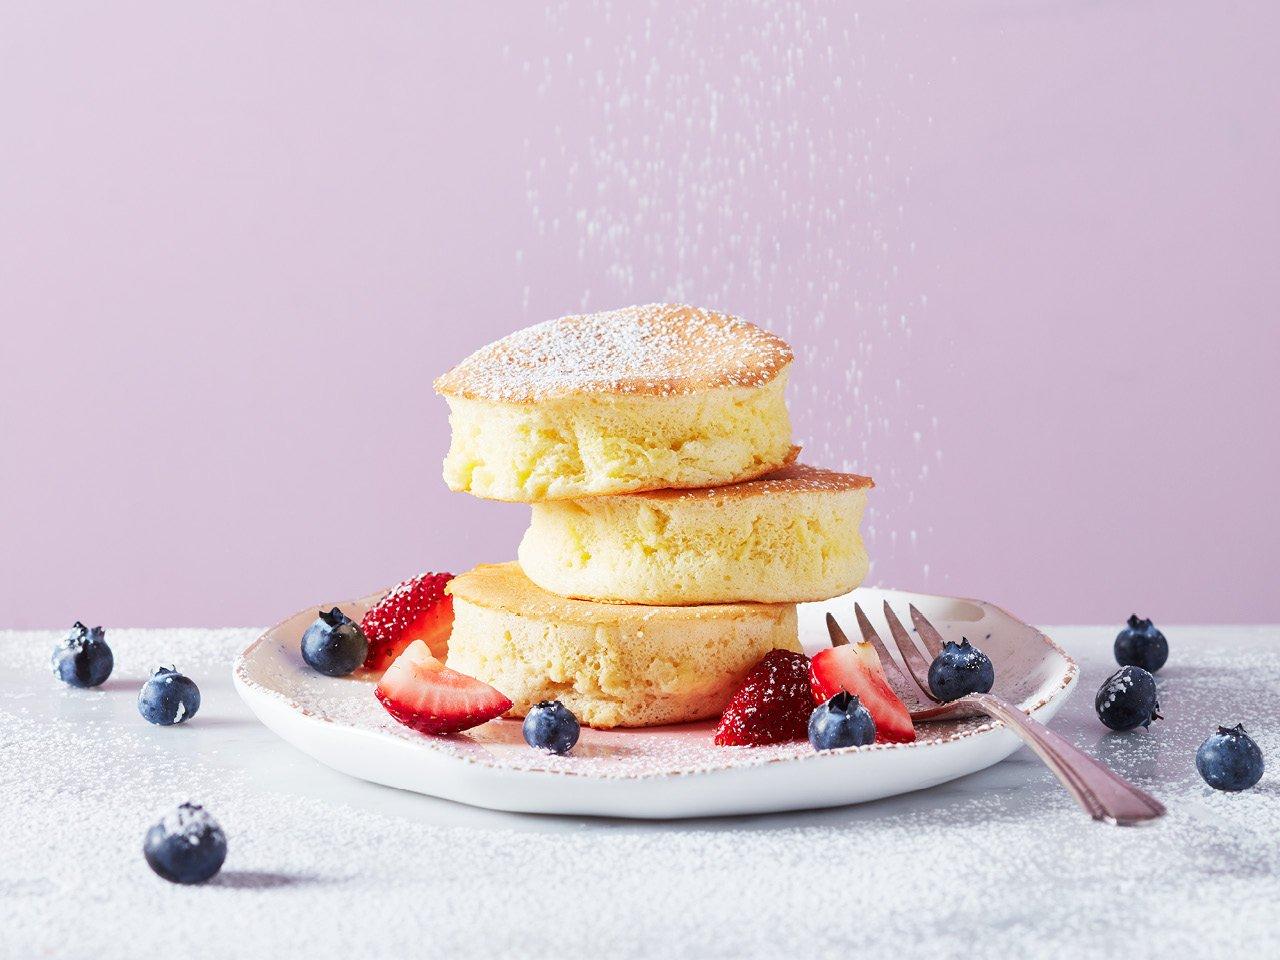 Pancakes jaanischer Art servieren mit Puderzucker bestäuben